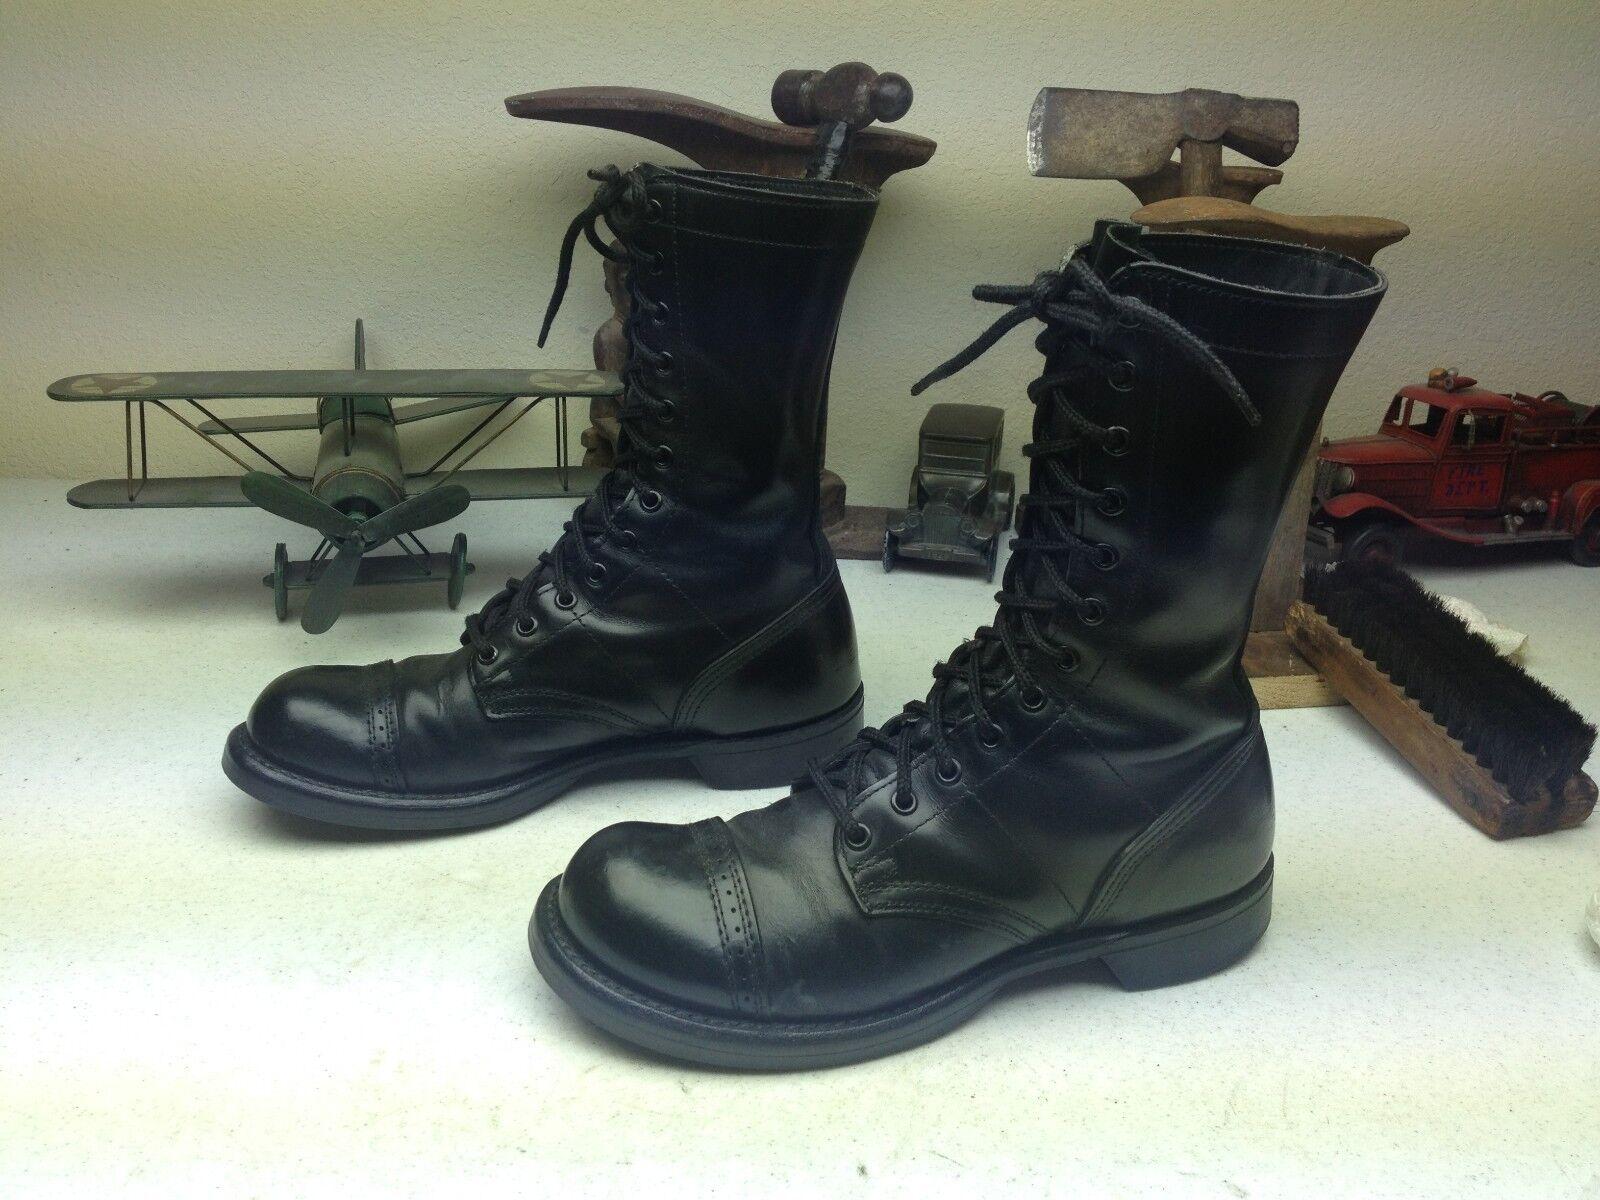 CORCORAN De Cuero Negro Made in USA Military Paracaidista Combate Ejército botas botas 7.5 D